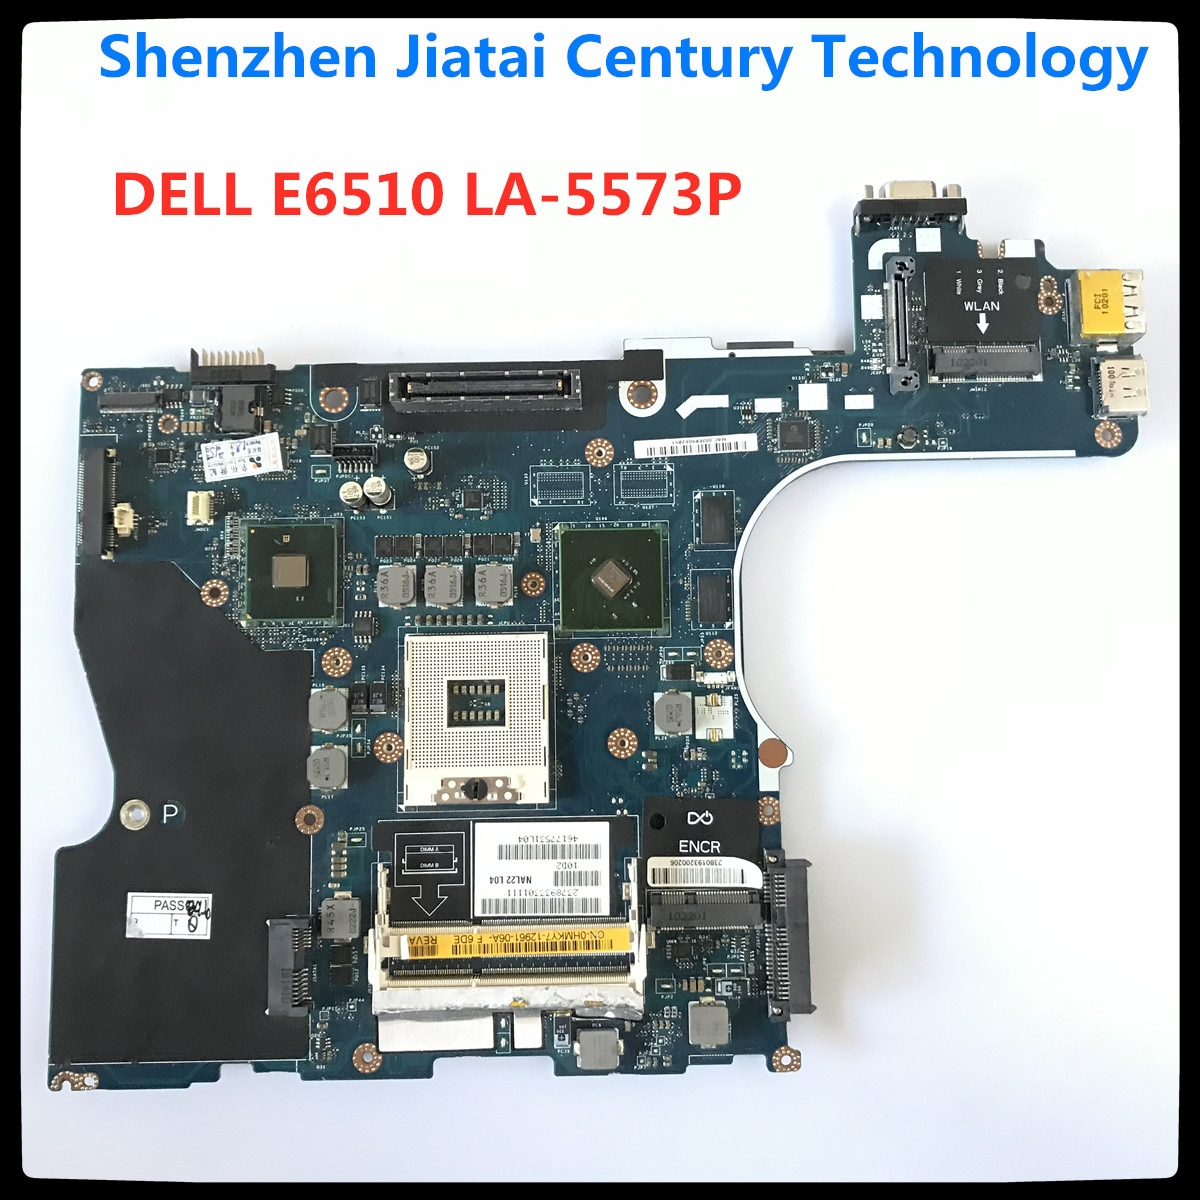 CN-0NCPCN 0NCPCN NCPCN Für Dell Latitude E6510 Laptop motherboard QM57 Mainboard NAL22 LA-5573P N10M-NS-B-B1 100% getestet arbeits